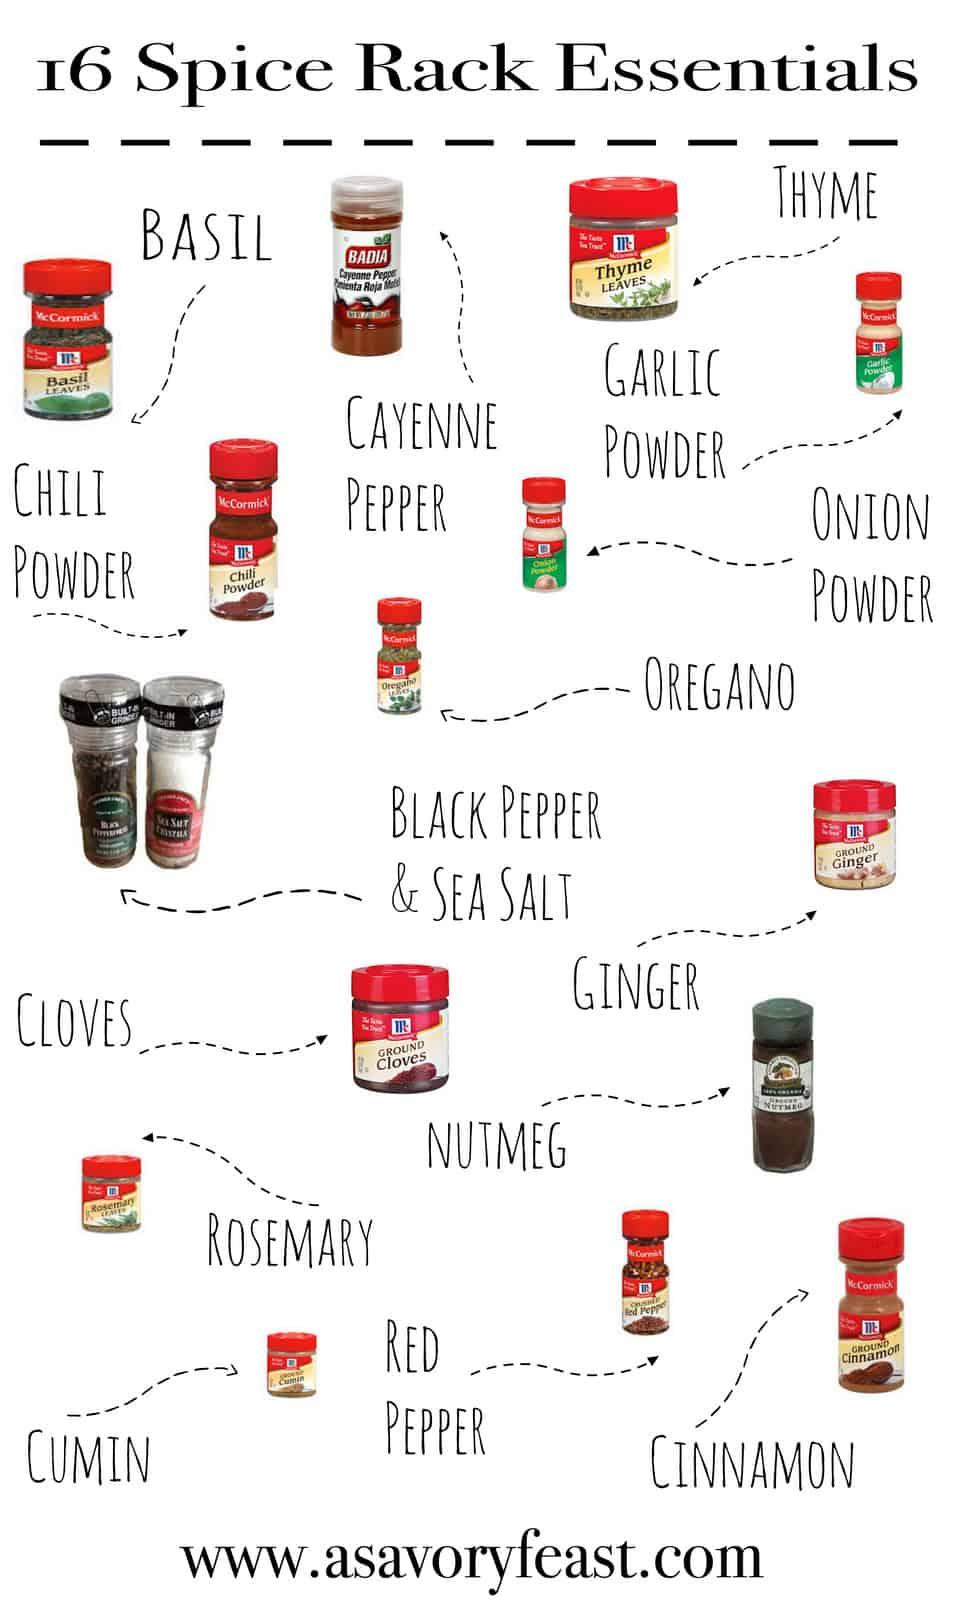 16 Spice Rack Essentials